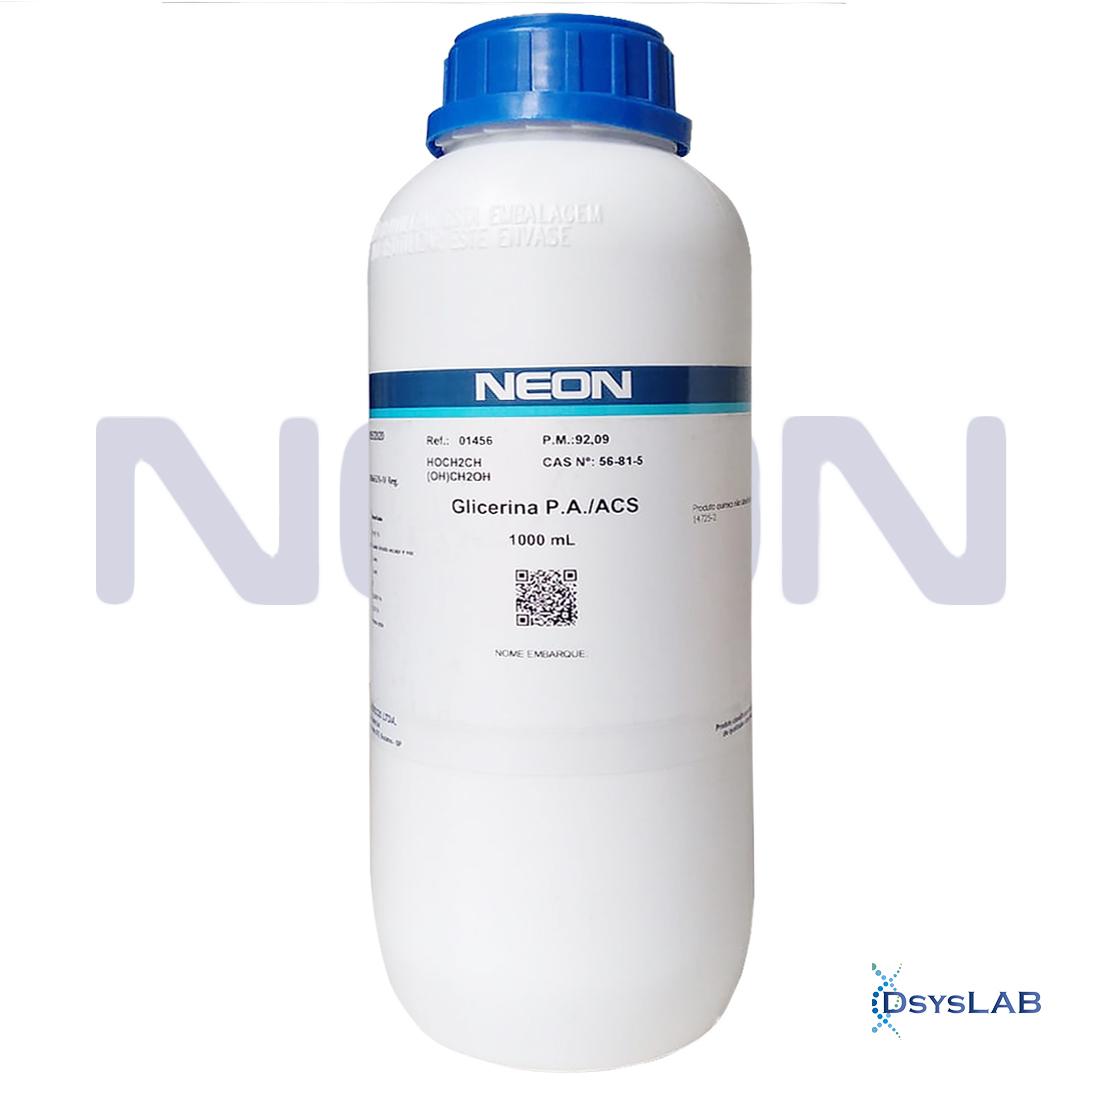 Glicerina P.A/ACS Neon